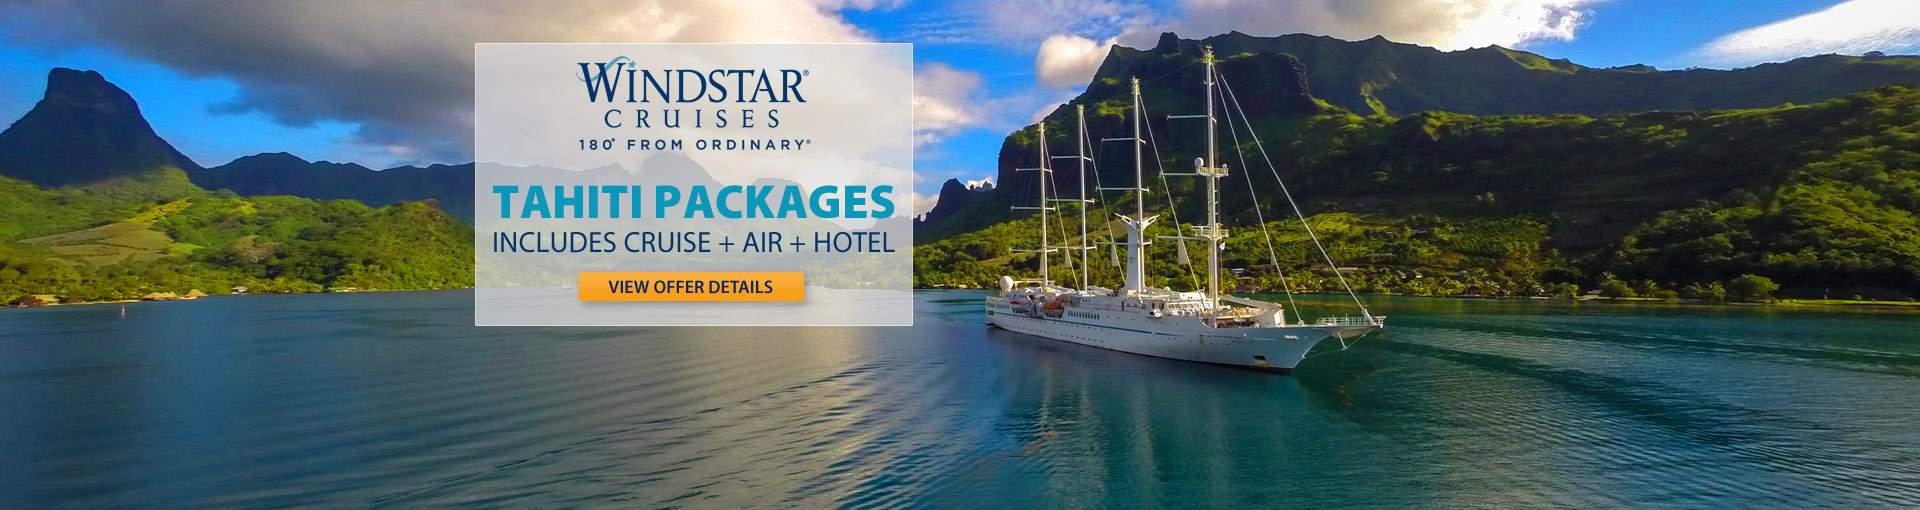 Windstar Cruises: Tahiti Packages